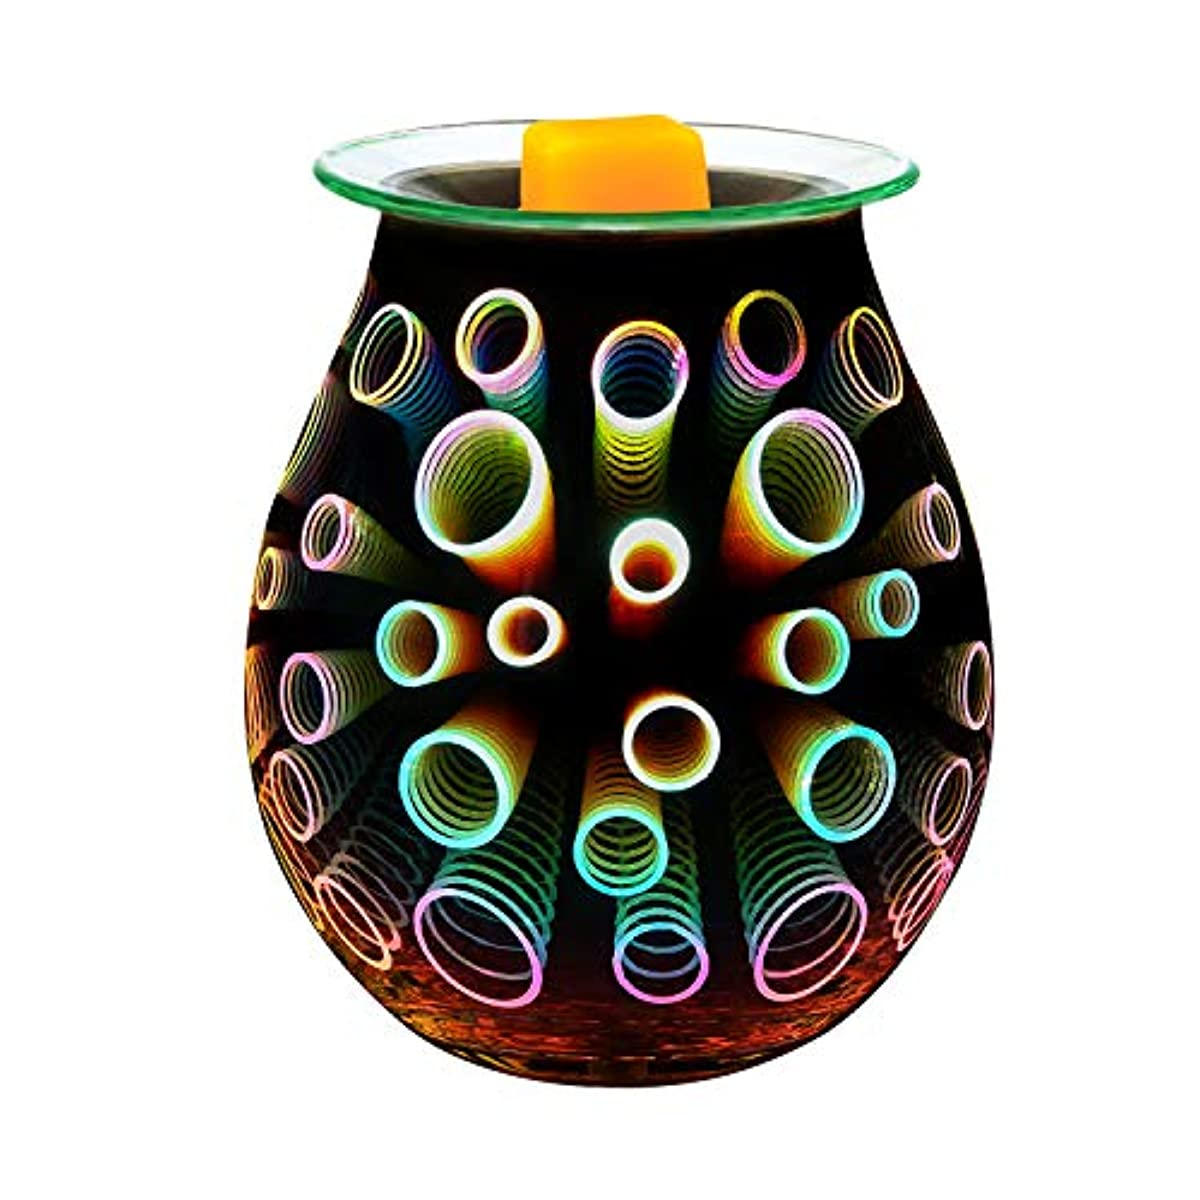 COOSA Electric Oil Warmer、美しいガラスワックスTart Burner夜ライトアロマ装飾ランプwith 3d効果のGifts & Decor EL0717_US